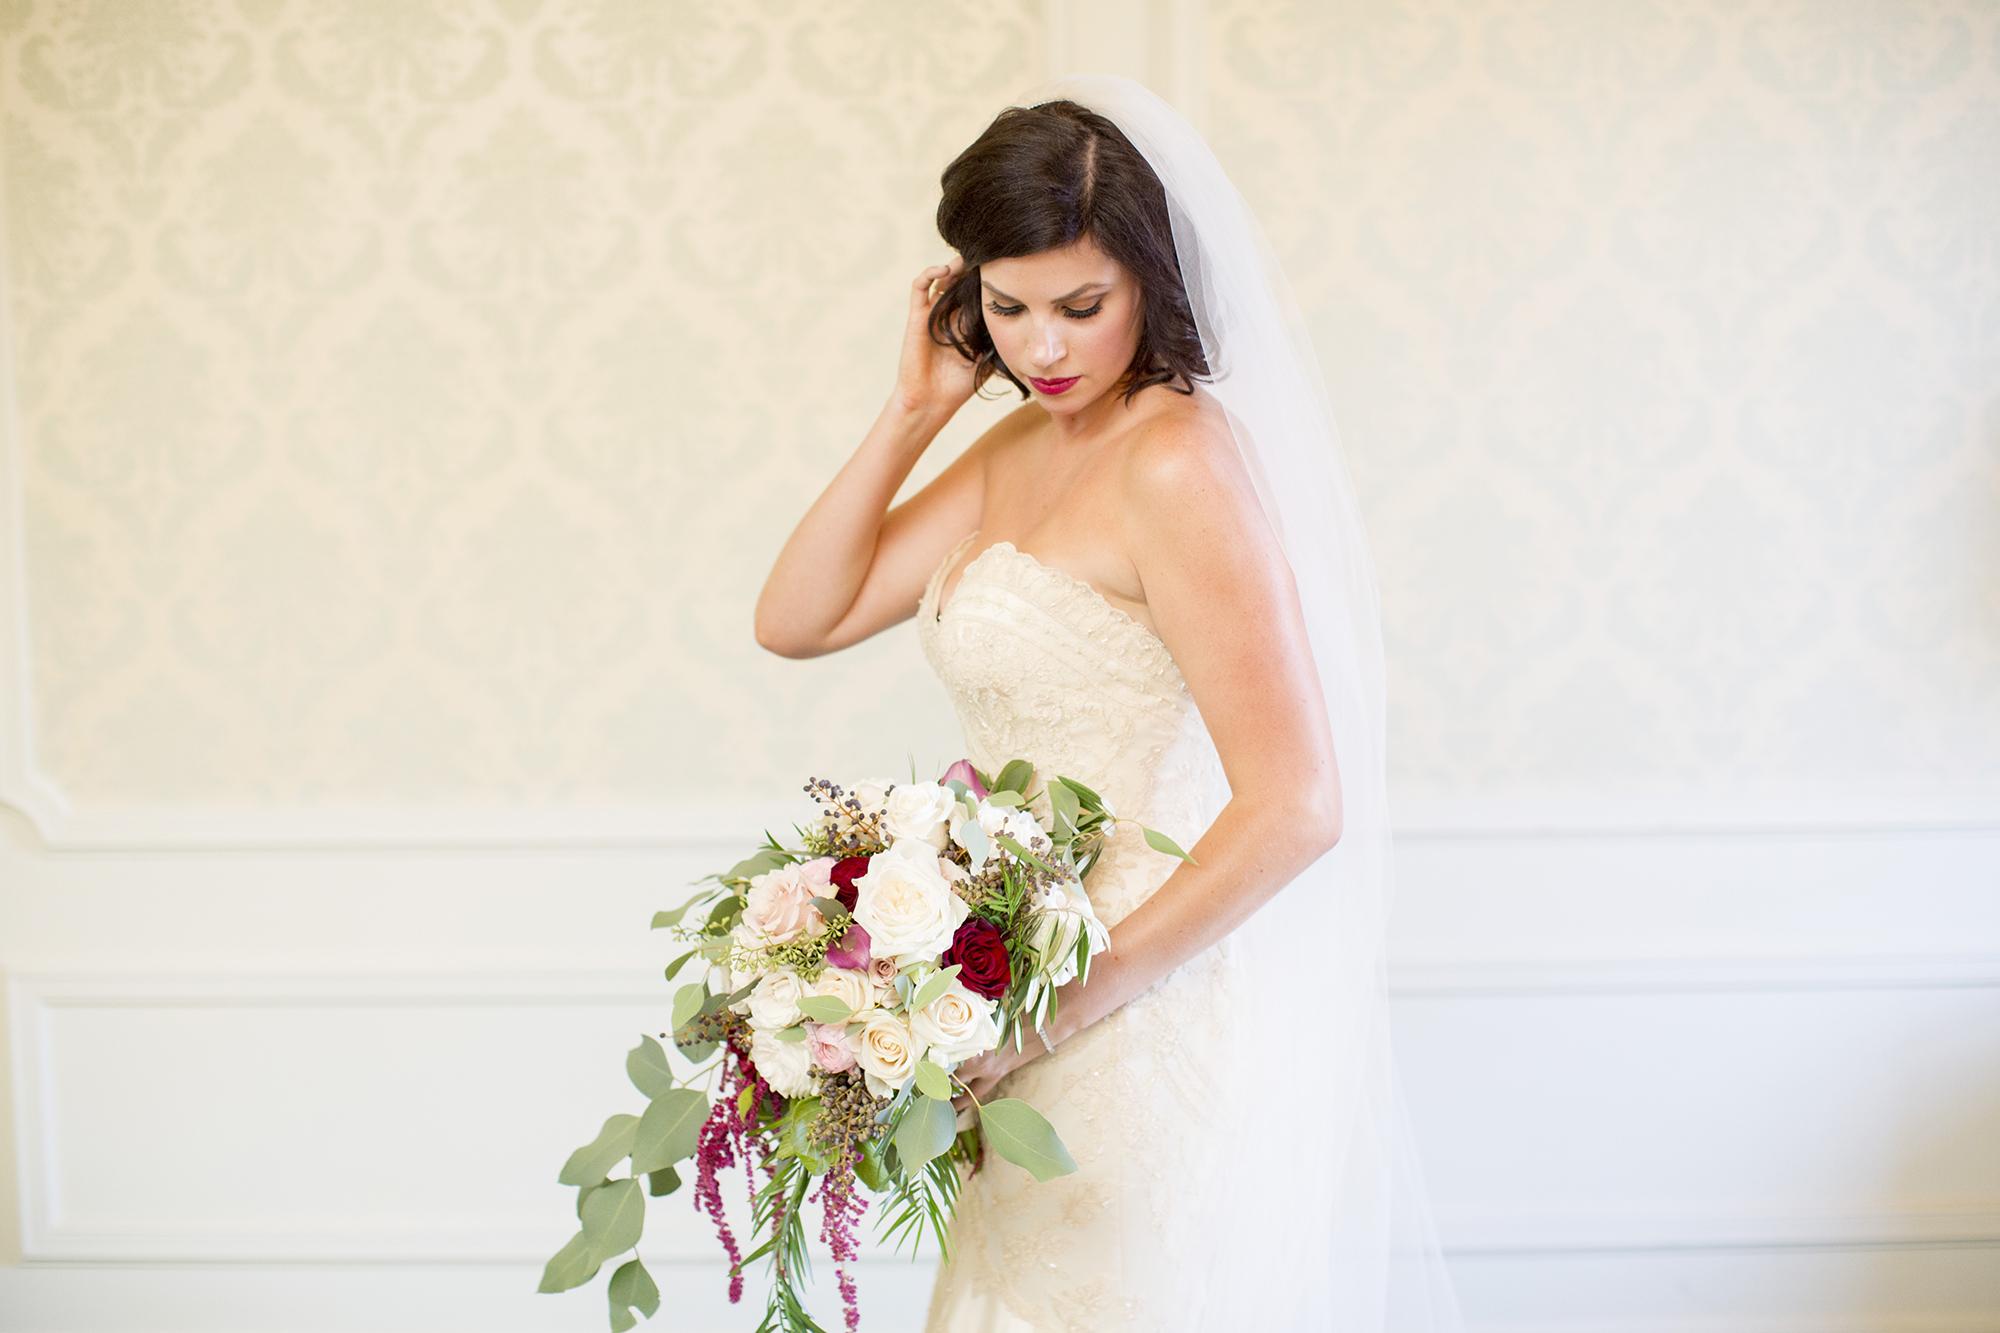 Seriously_Sabrina_Photography_Lexington_Kentucky_Wedding_Photographer_Boone856.jpg